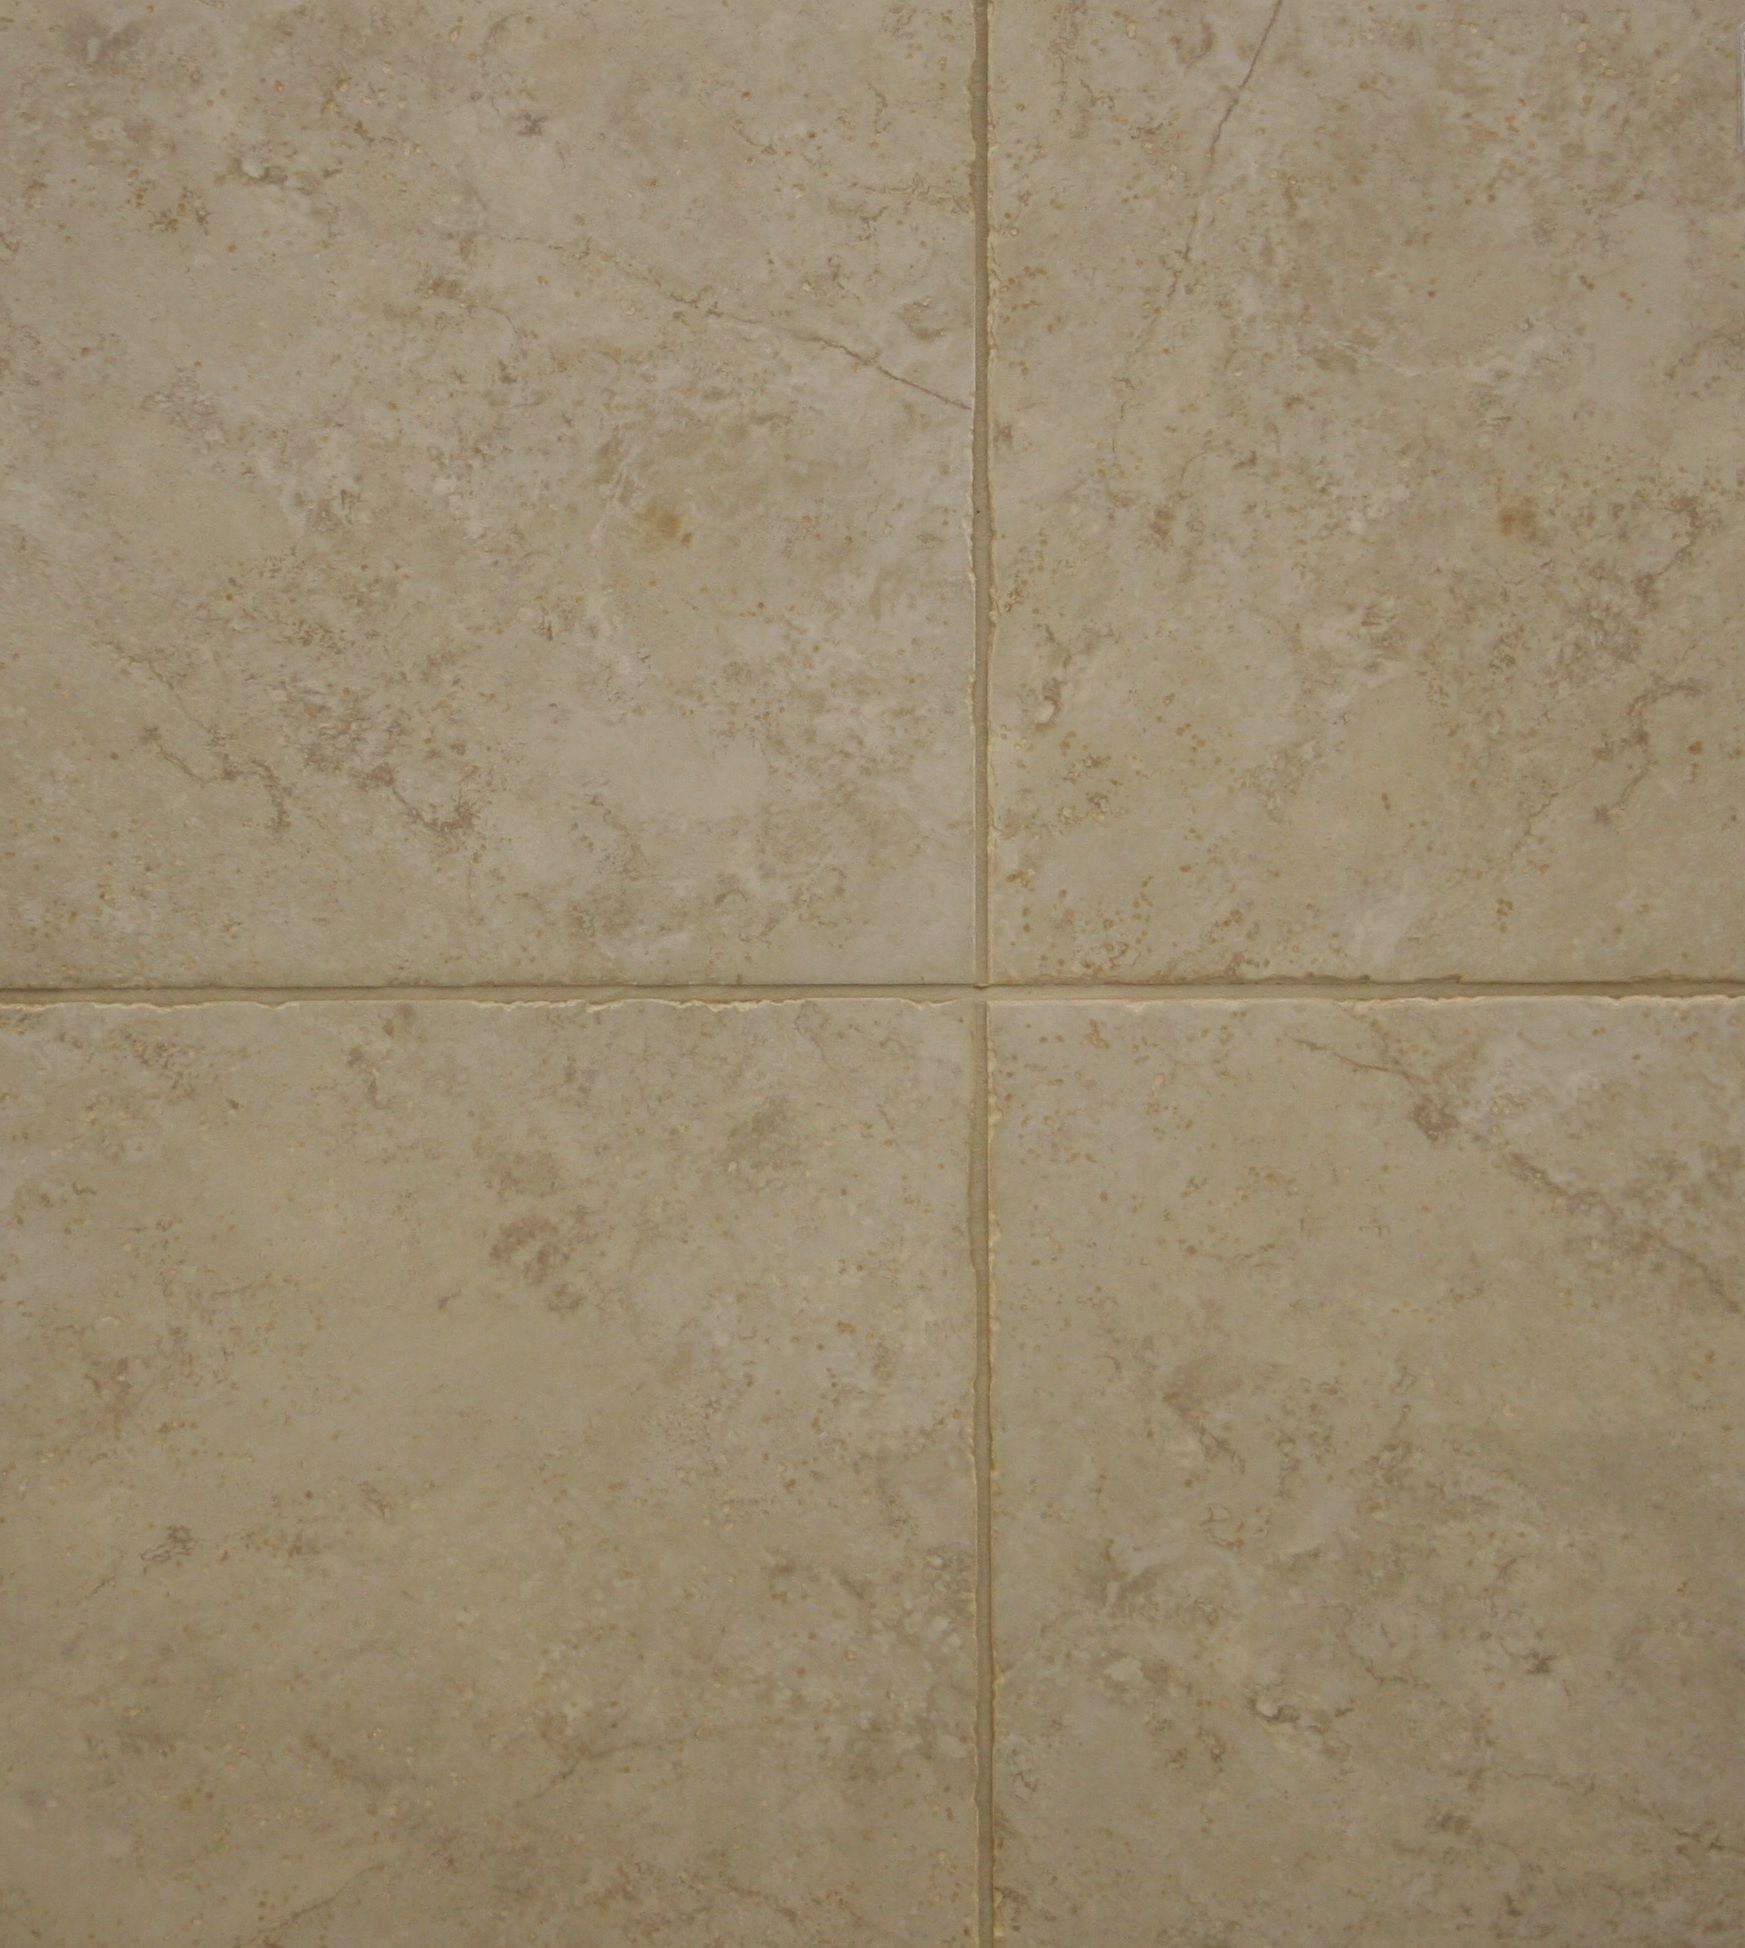 16x16 porcelain floor tile pamesa newport beige 18x18 flooring 16x16 porcelain floor tile pamesa newport beige 18x18 dailygadgetfo Choice Image